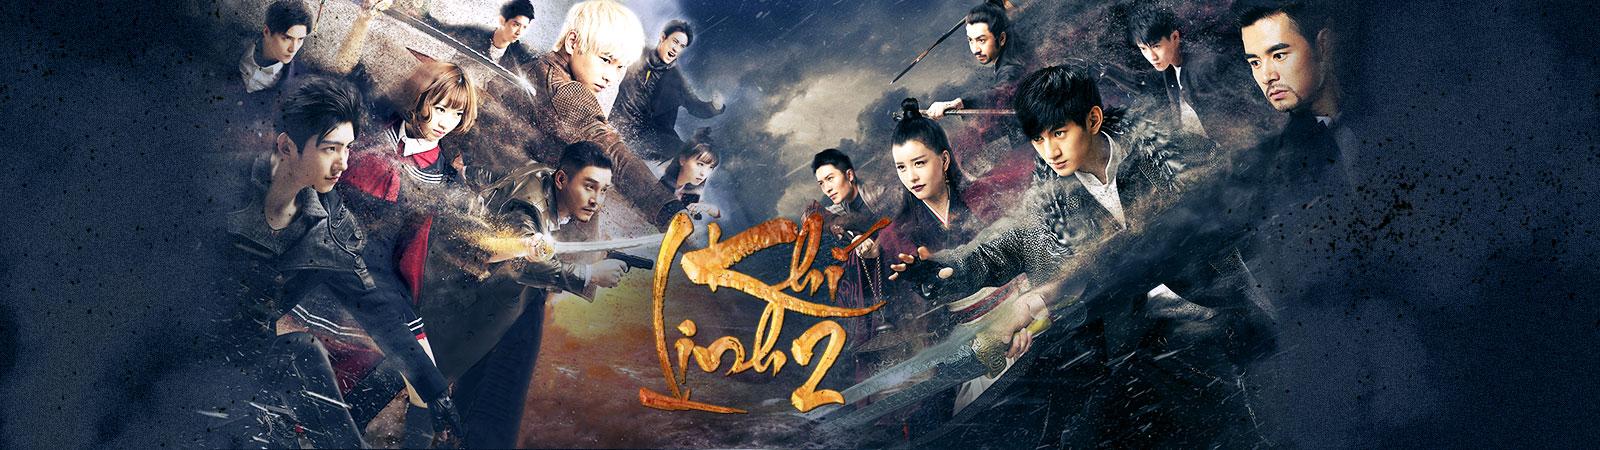 Khí Linh